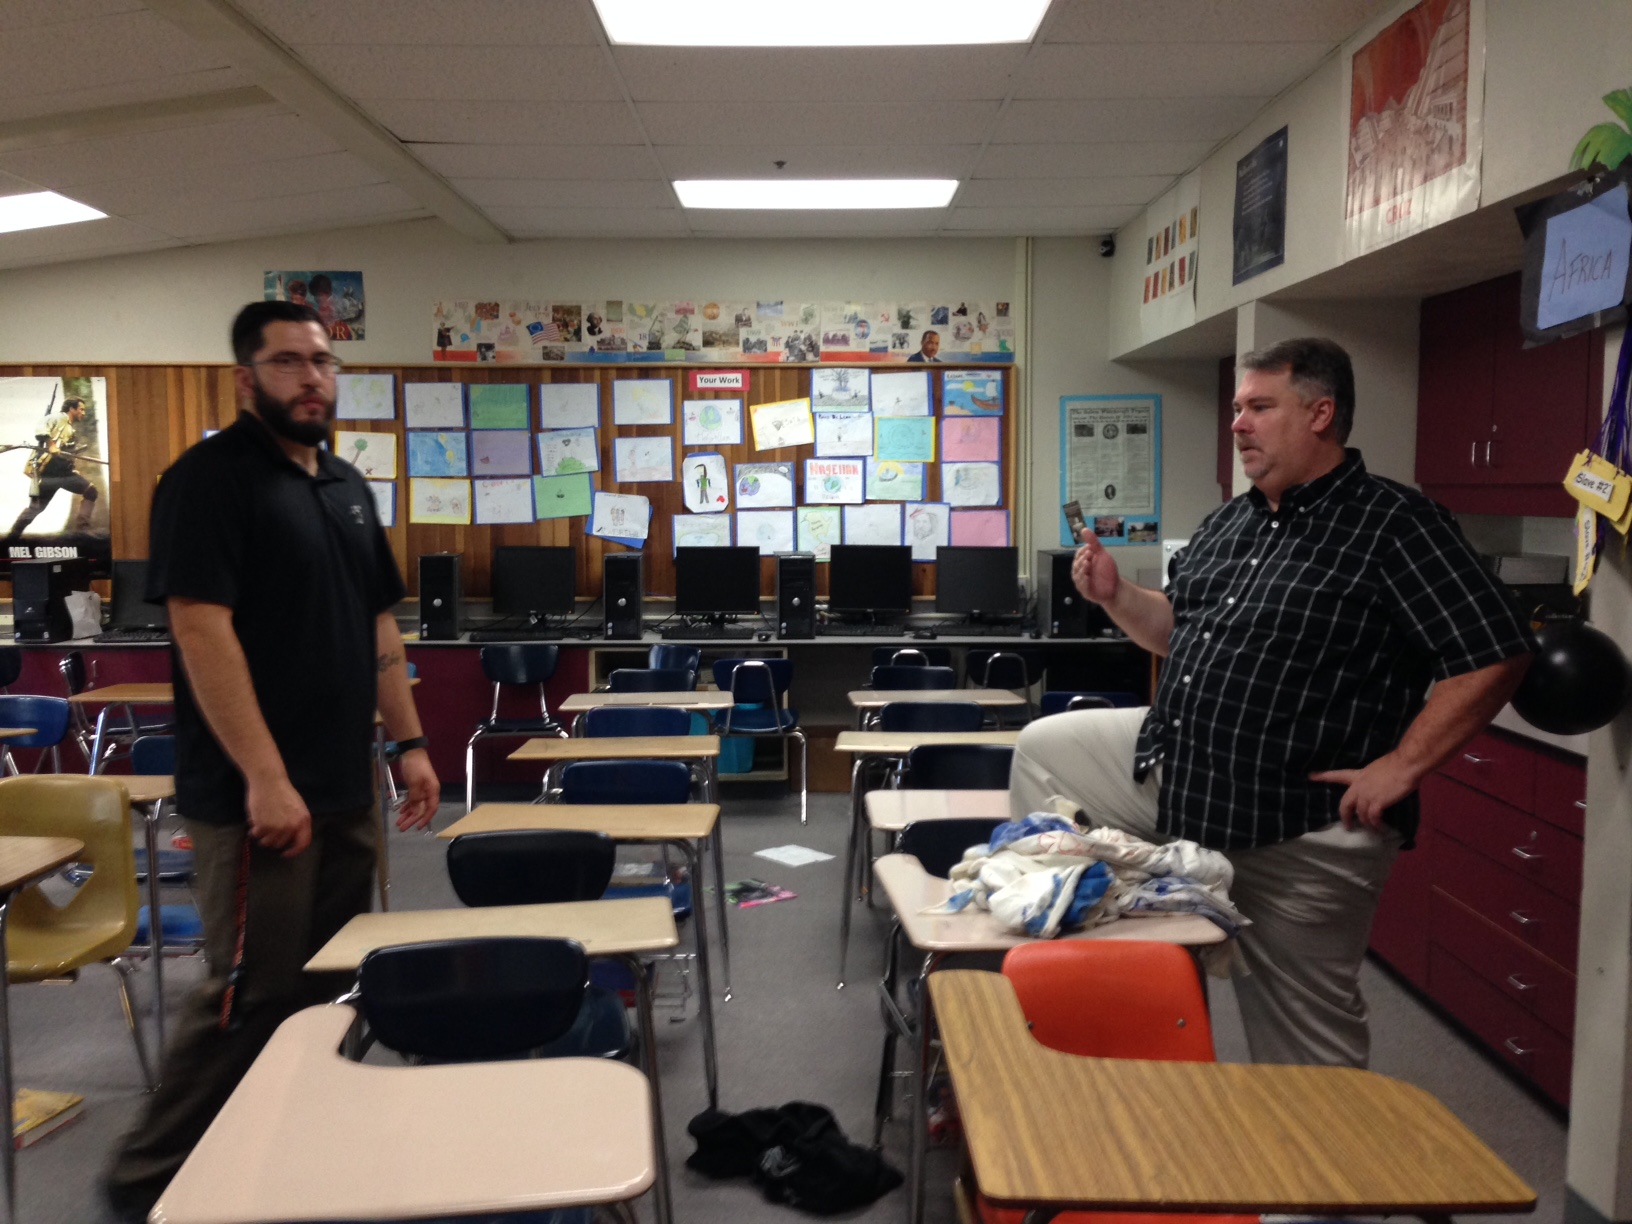 Randy Johnson S Field Is His Classroom